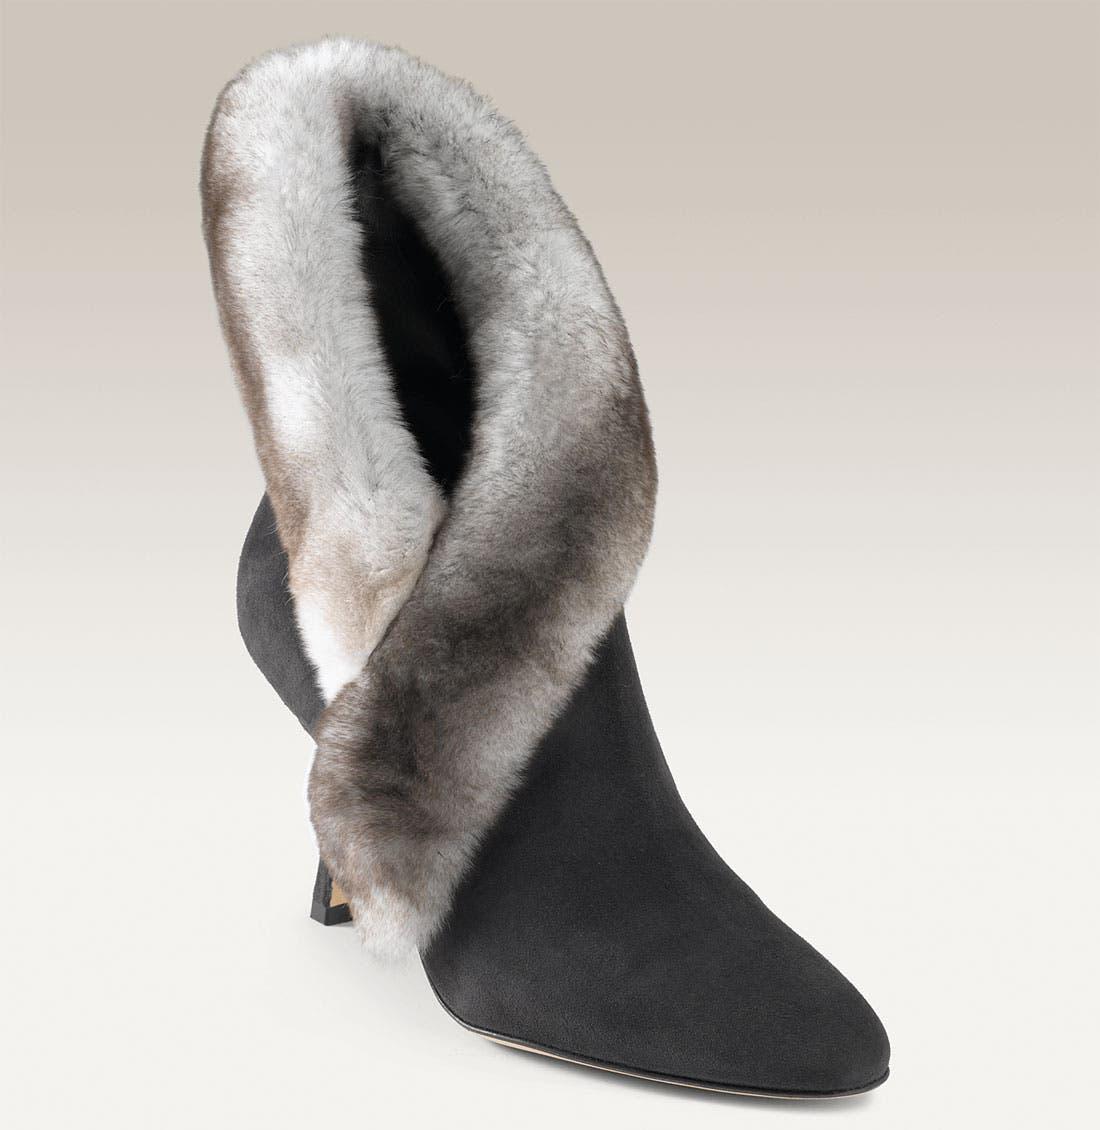 Main Image - Manolo Blahnik 'Nesta' Fur Trim Bootie